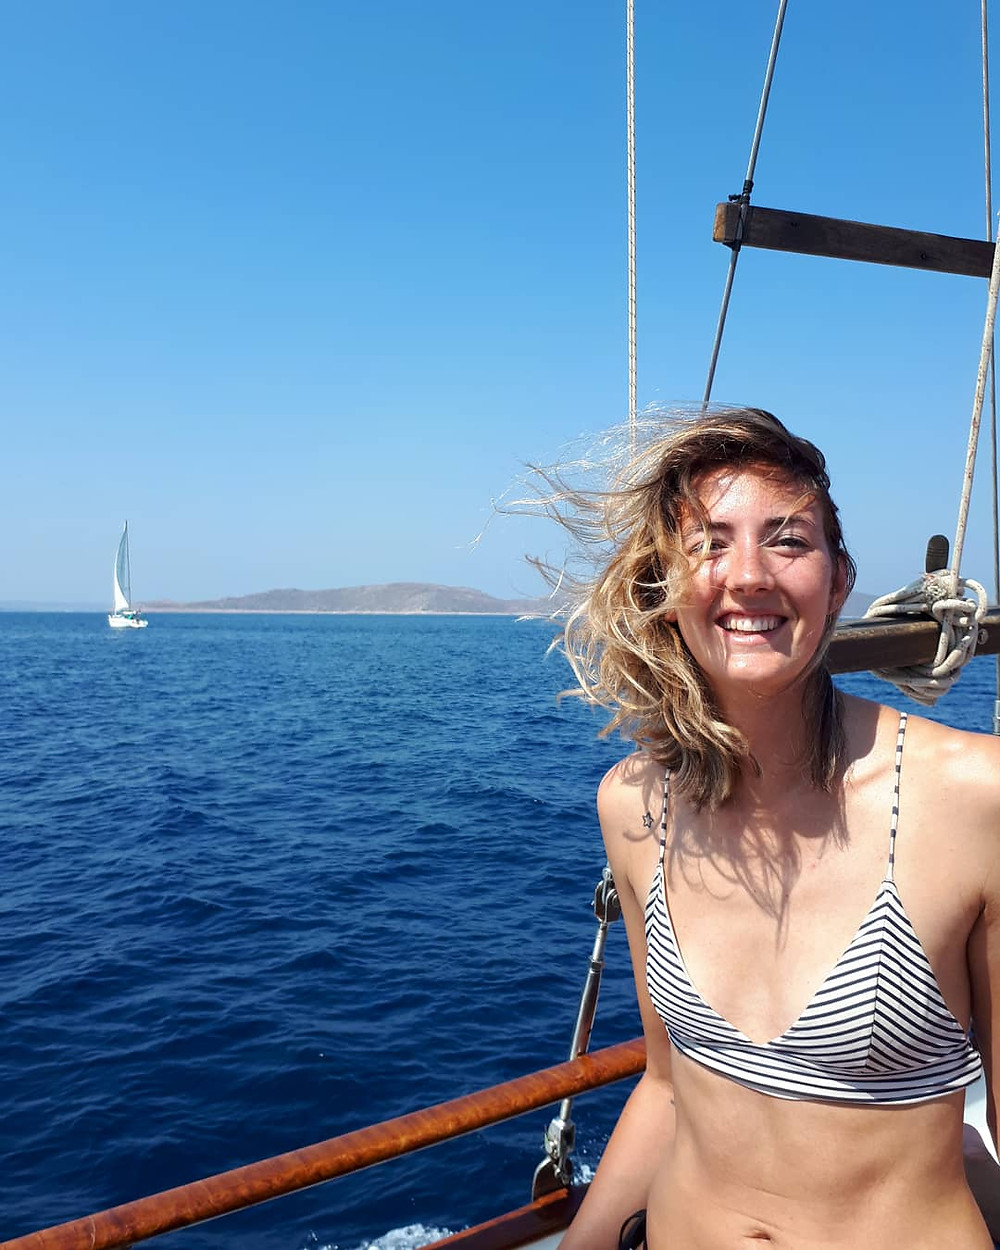 Relaxing boattrip on the Aegean Sea